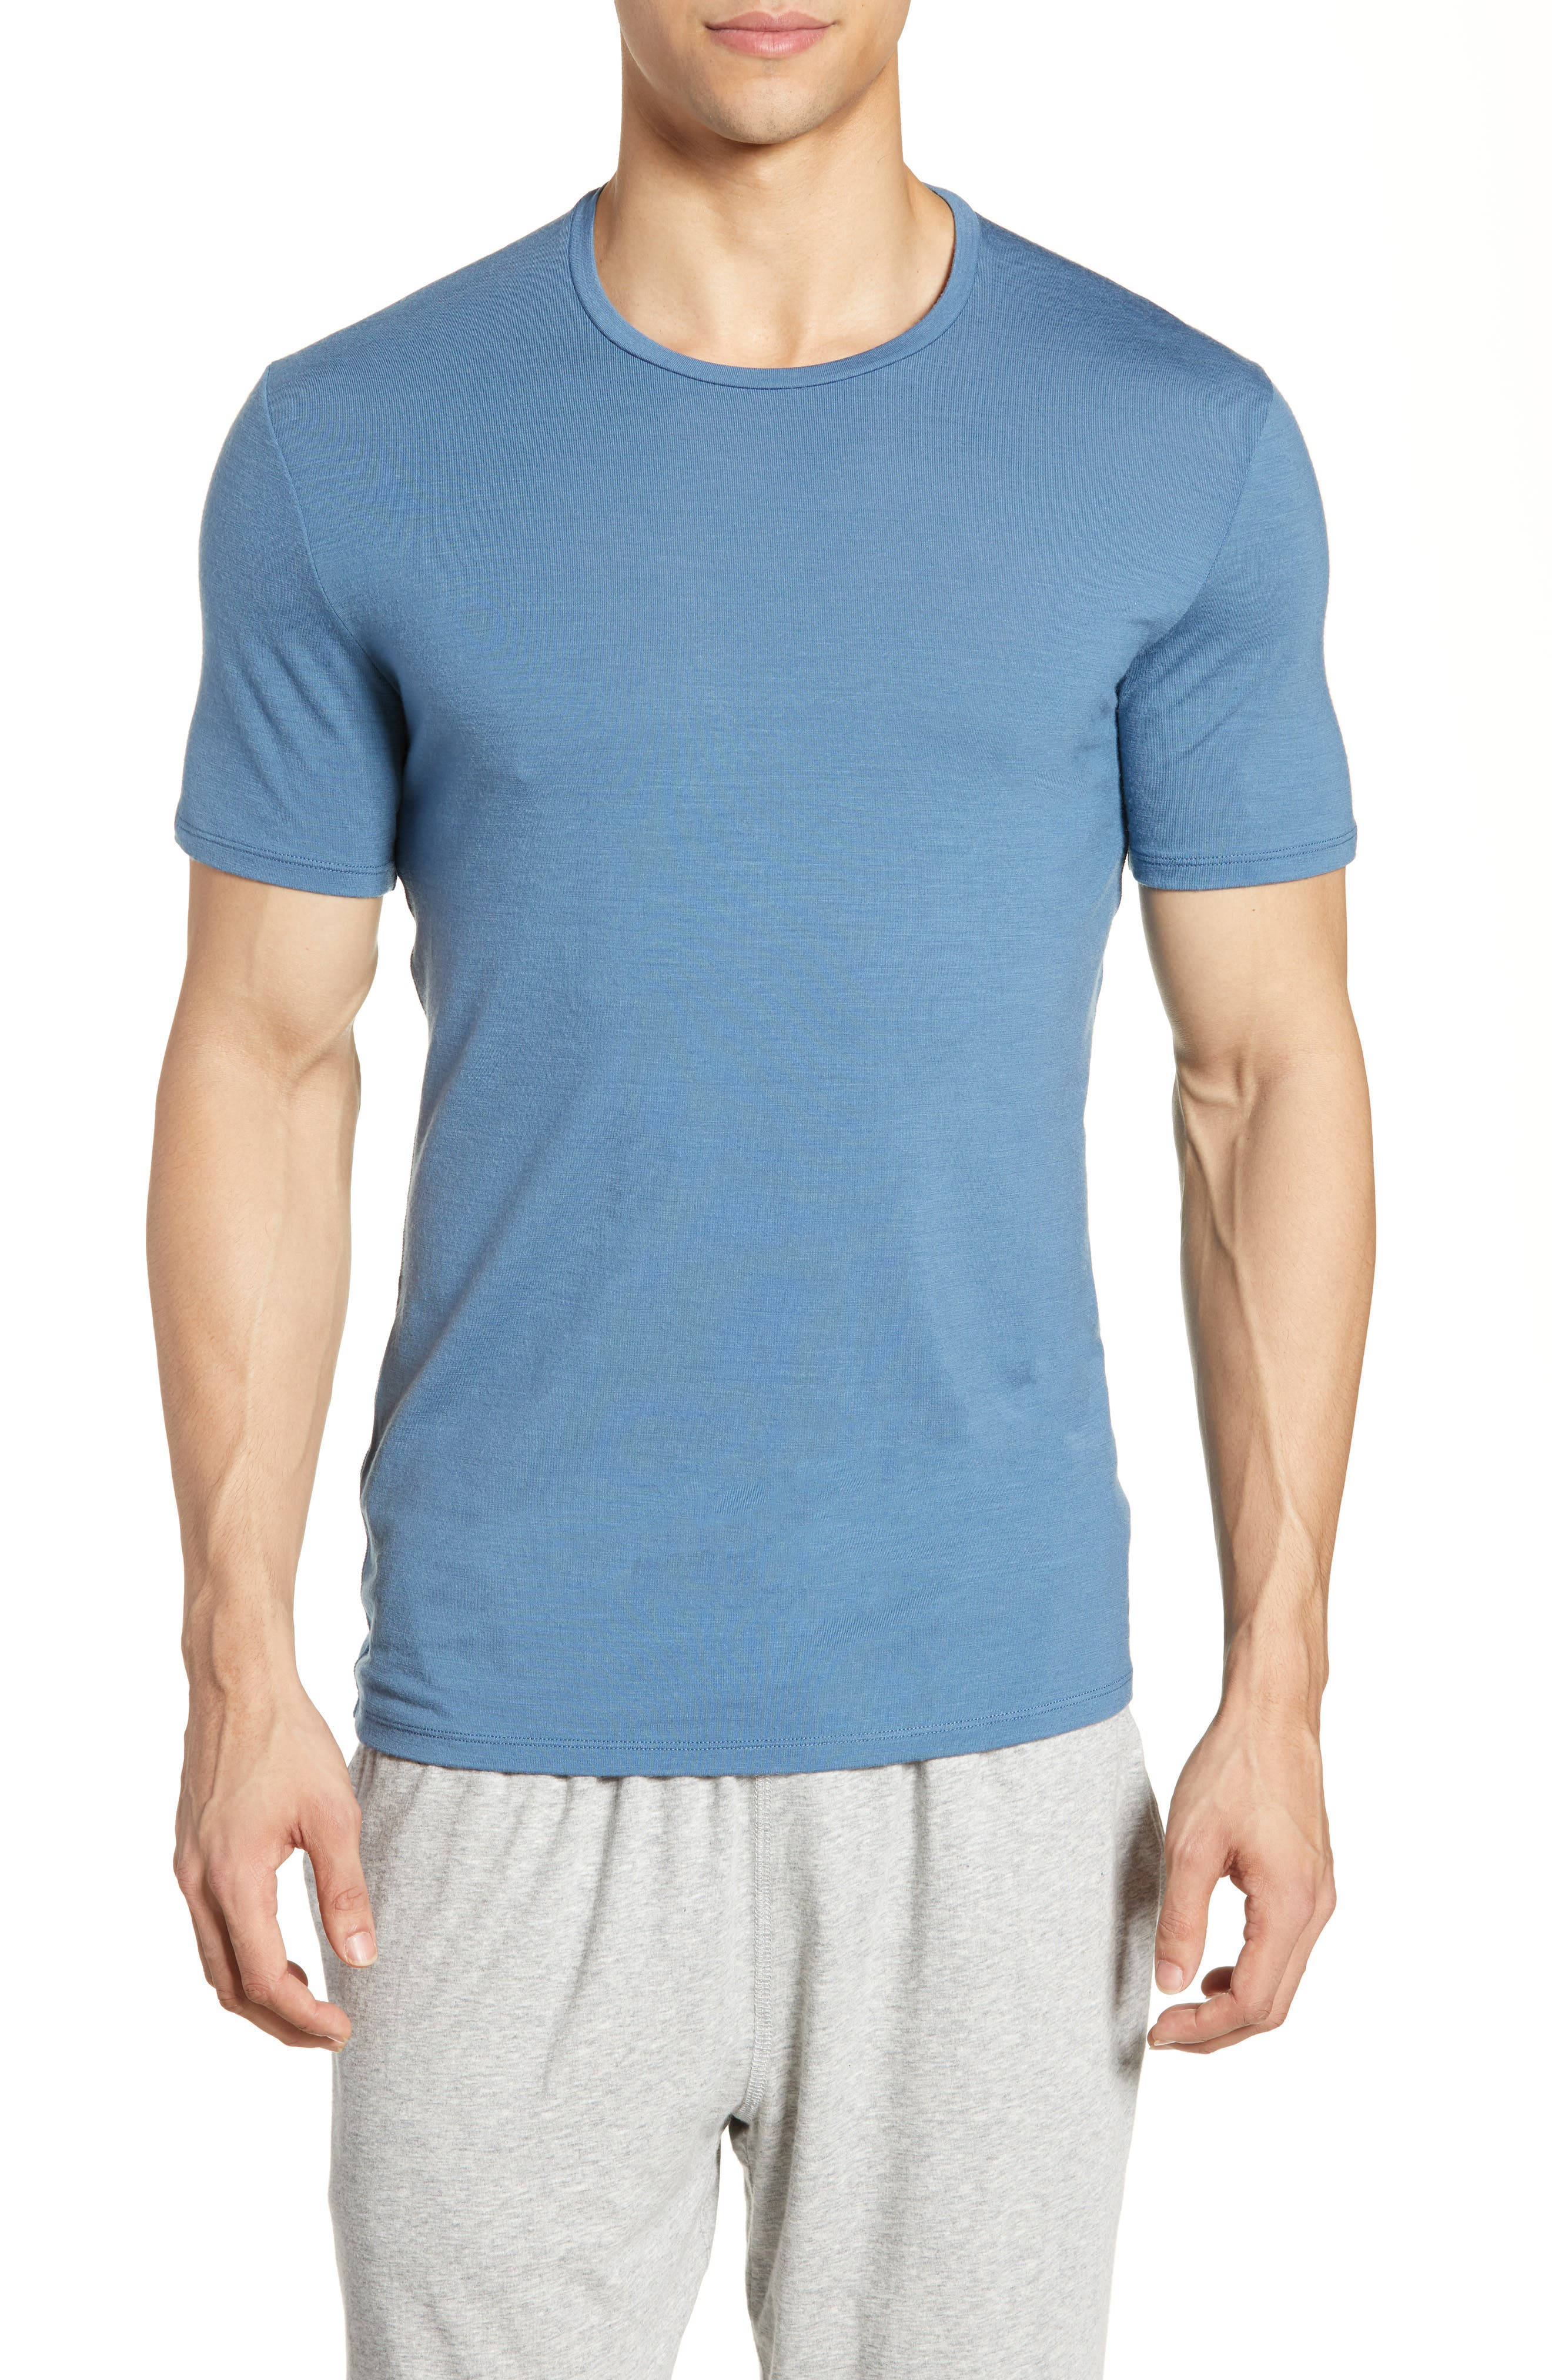 Icebreaker Anatomica Short Sleeve Crewneck T-Shirt, Blue